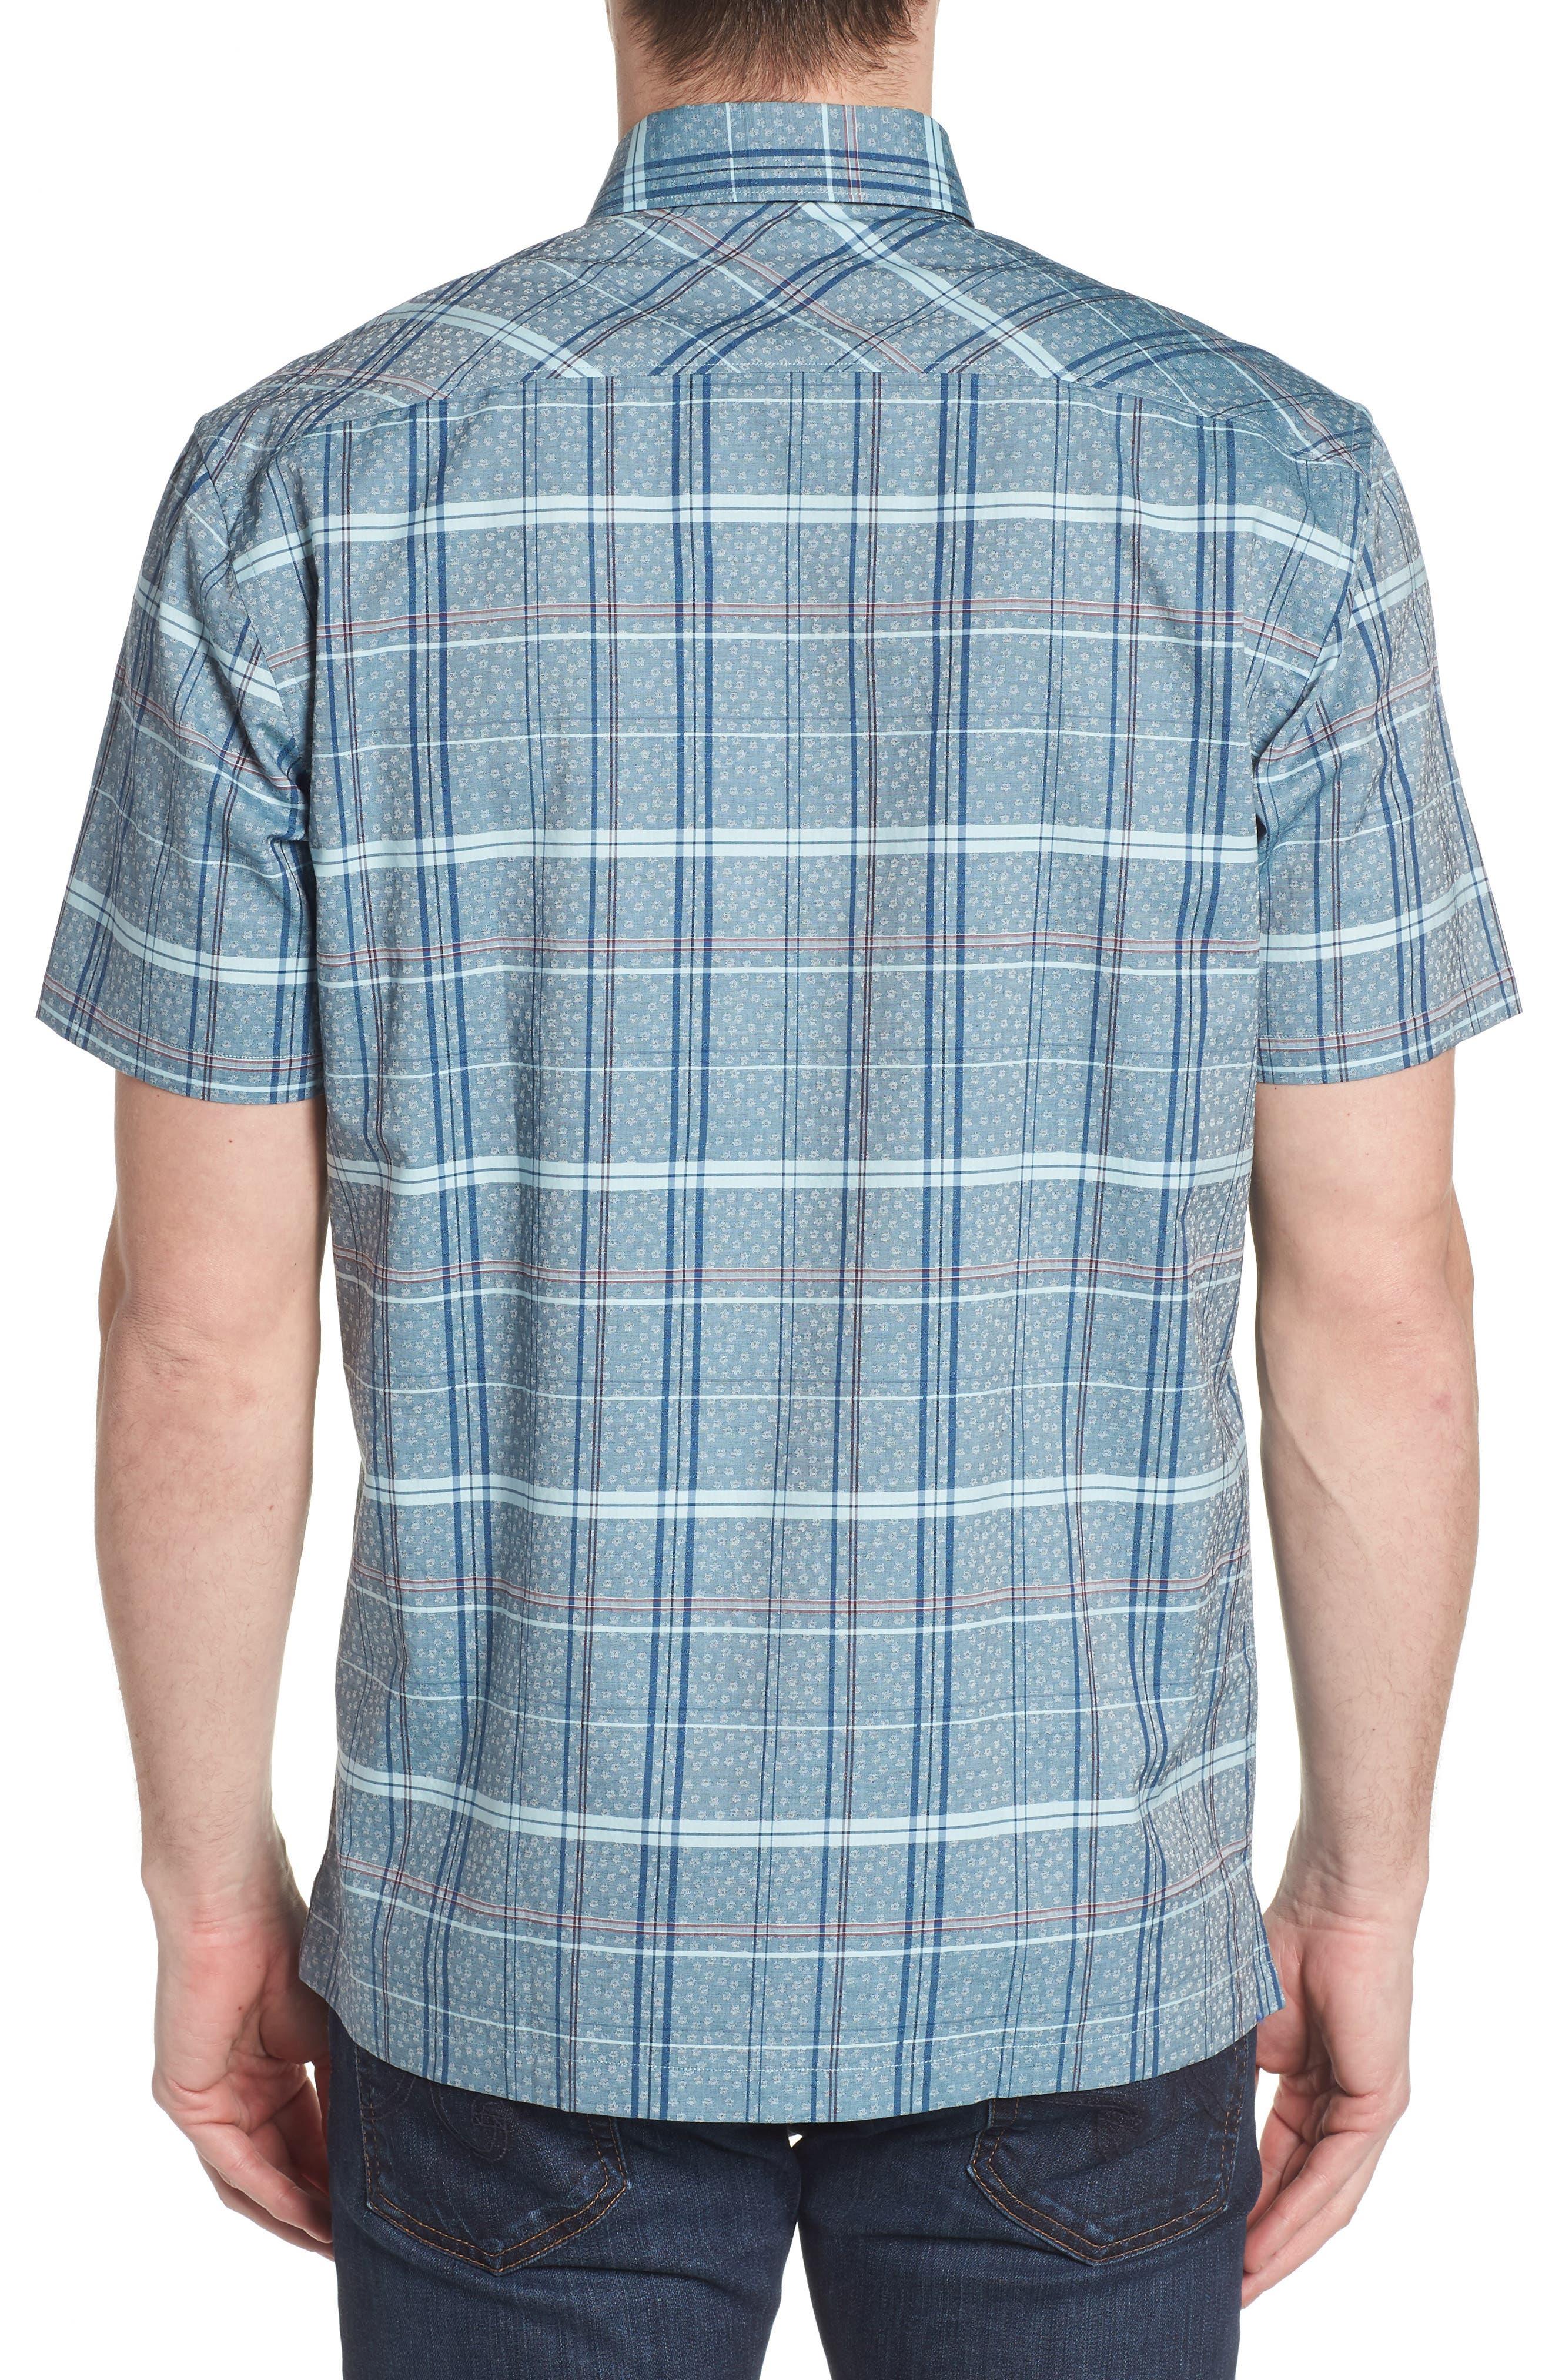 Vacaso Regular Fit Plaid Jacquard Sport Shirt,                             Alternate thumbnail 3, color,                             Water